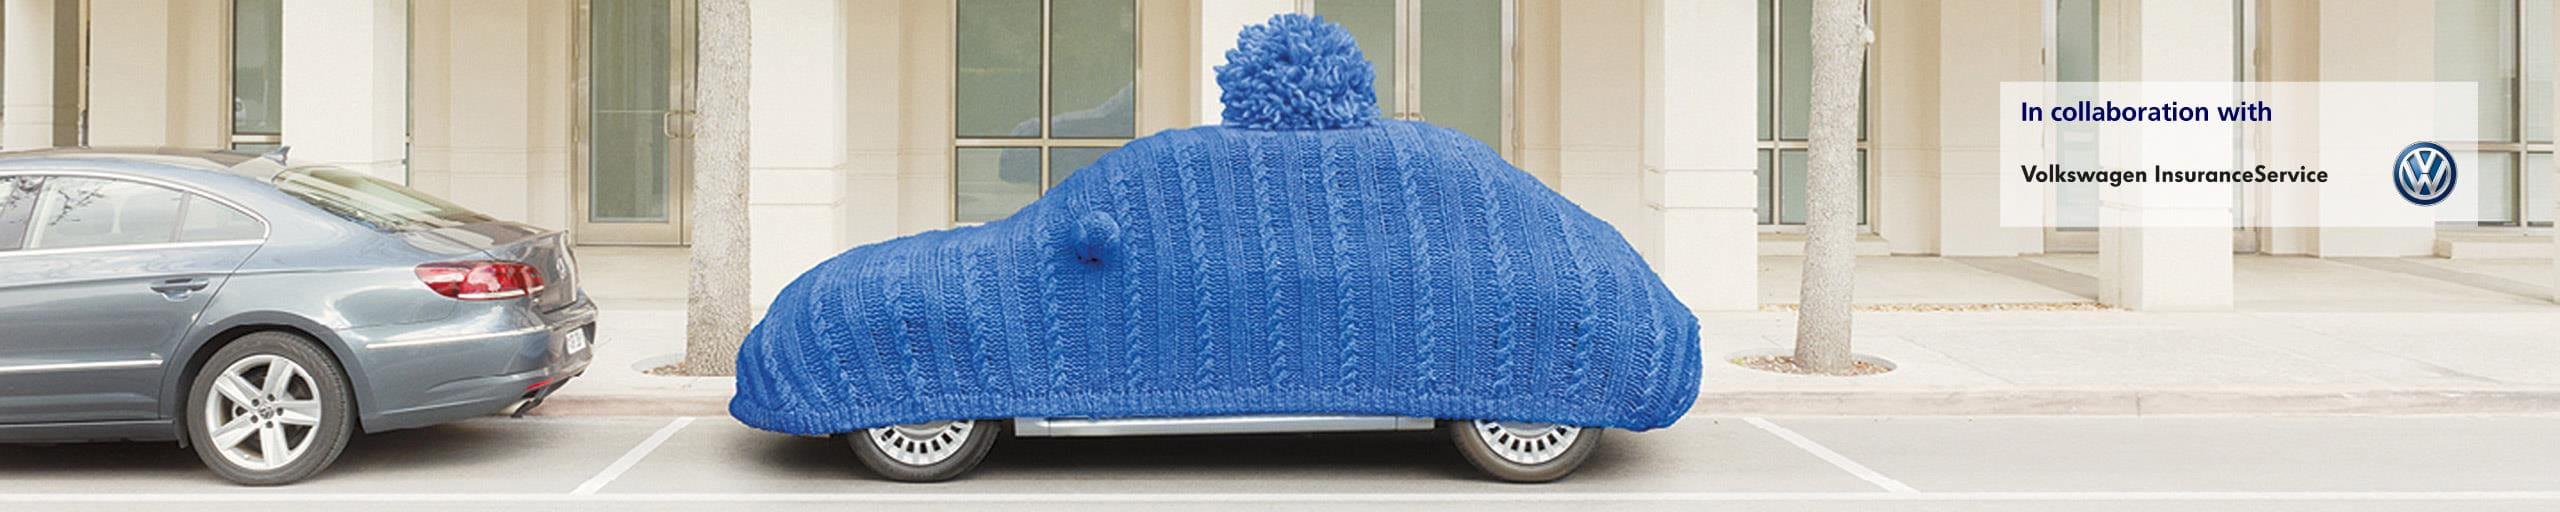 Volkswagen premium calculator motor vehicle insurance Zurich